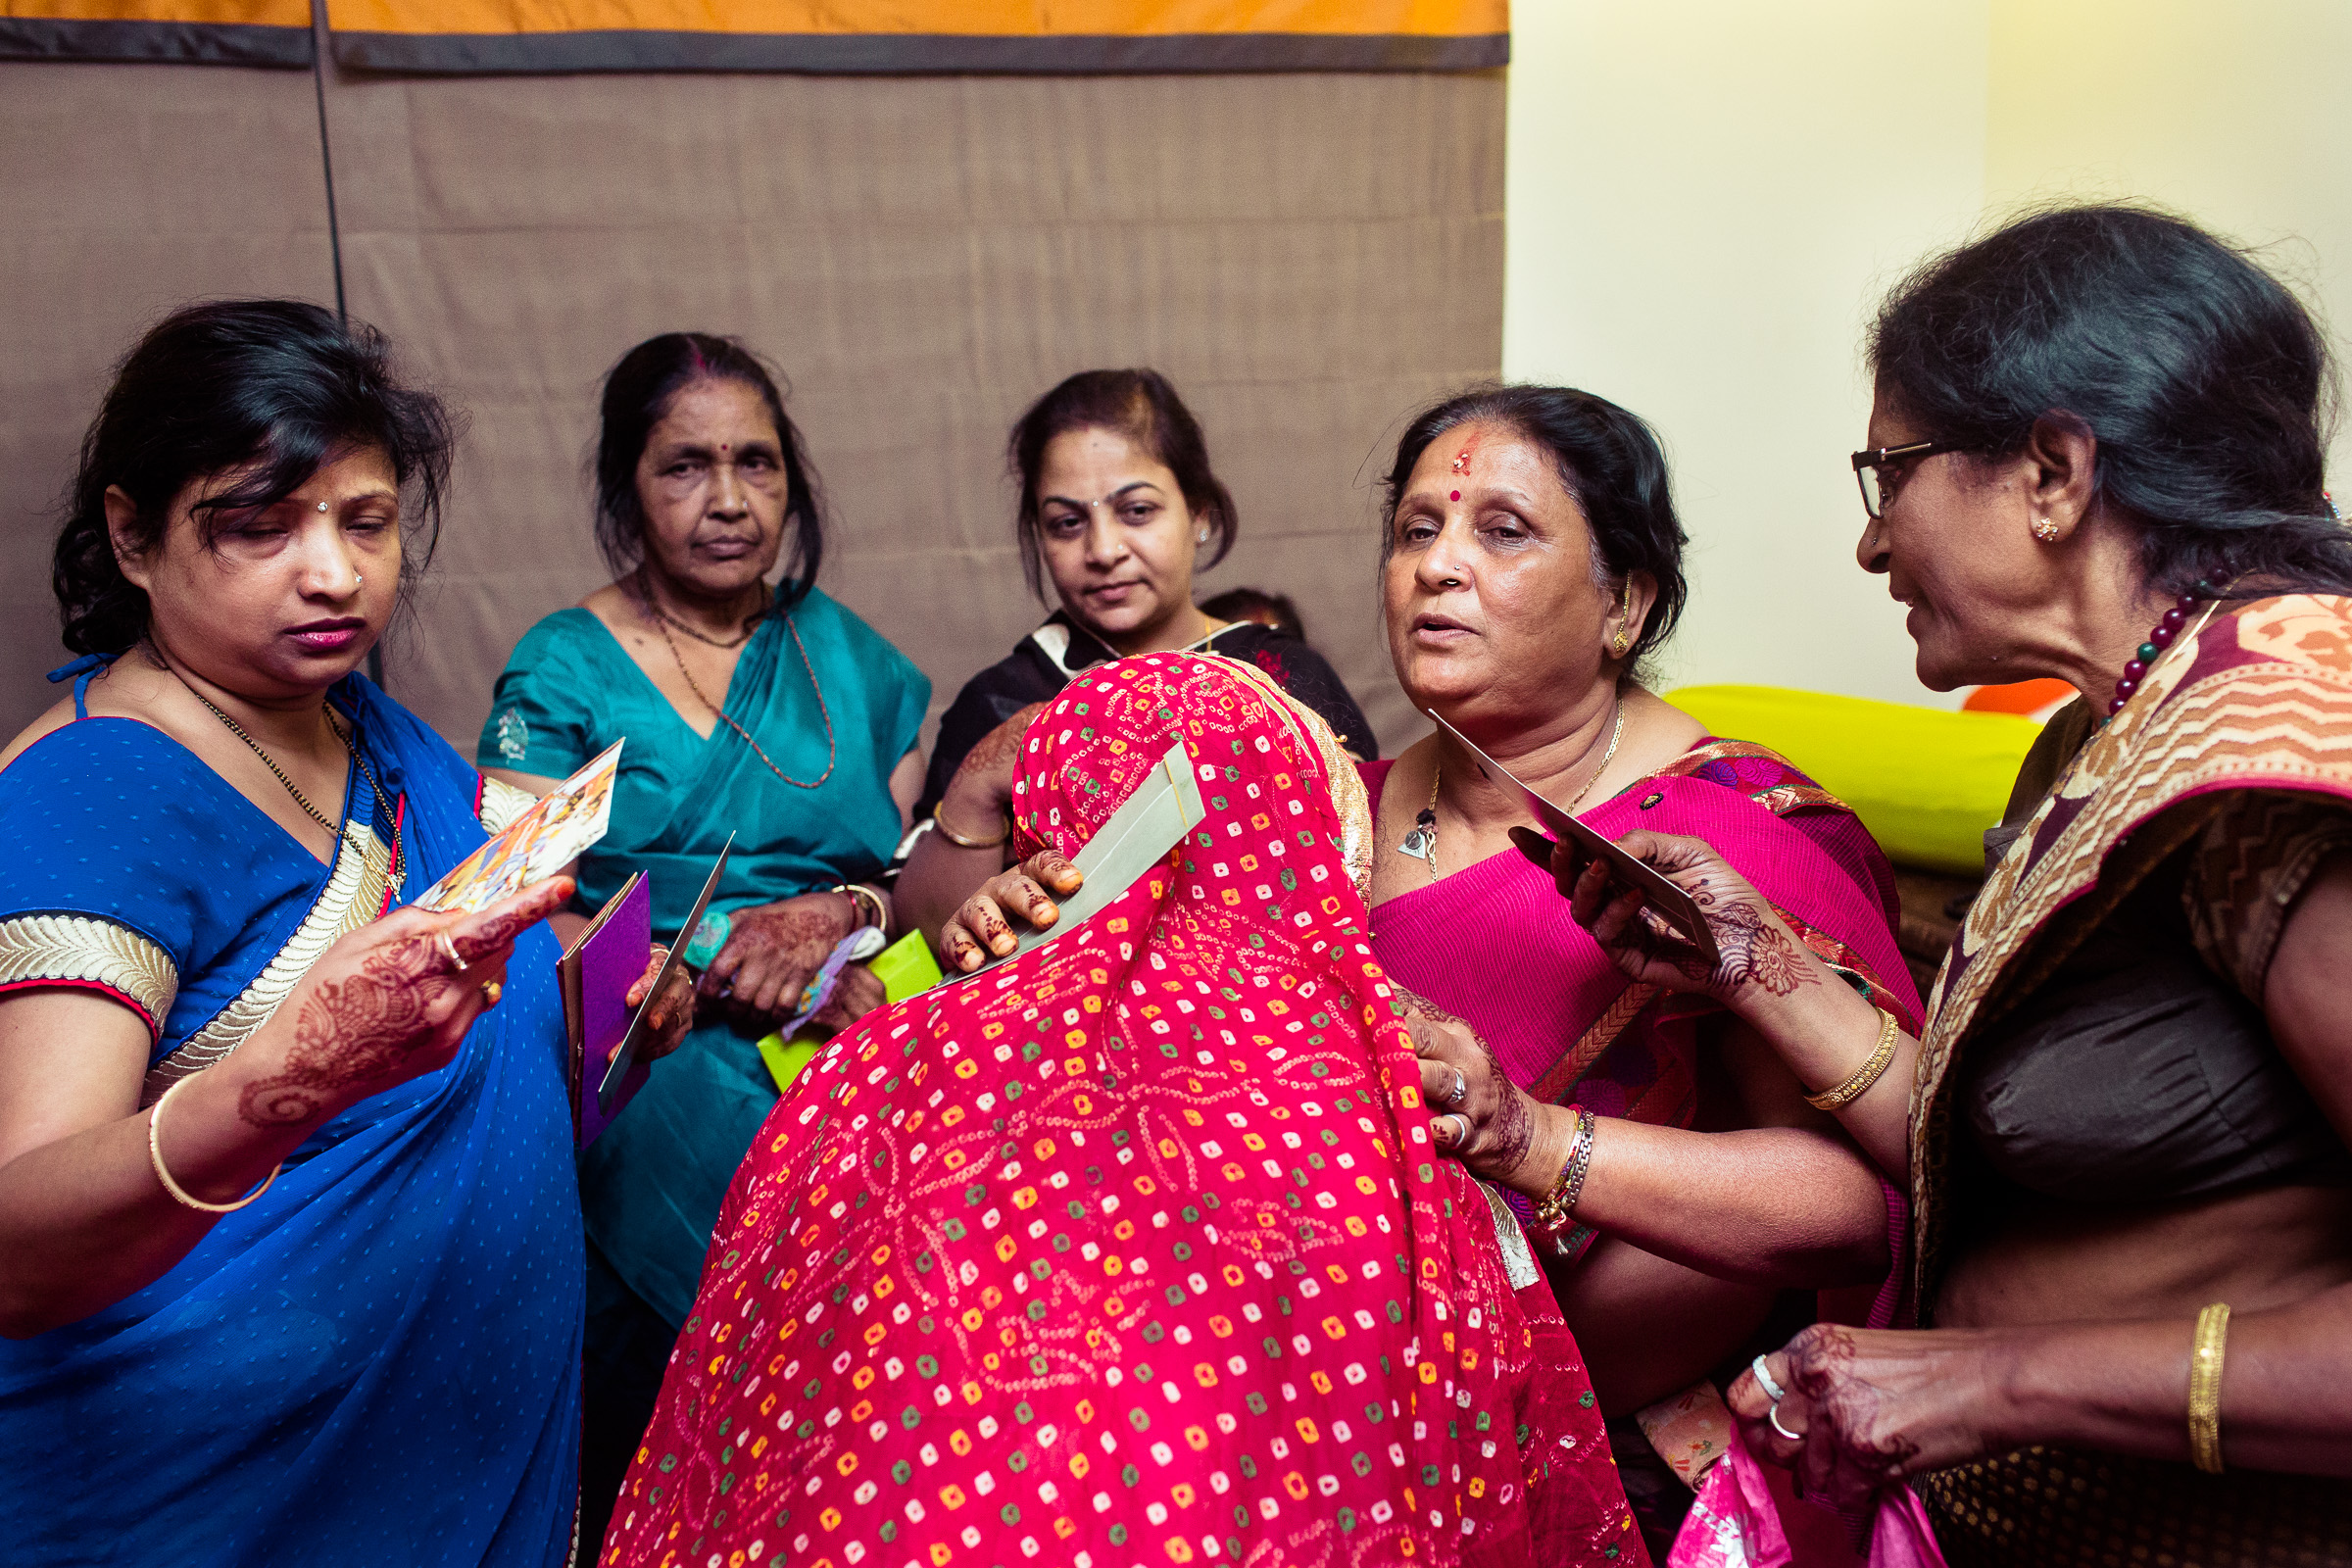 marwari-candid-wedding-photographers-bangalore-0062.jpg